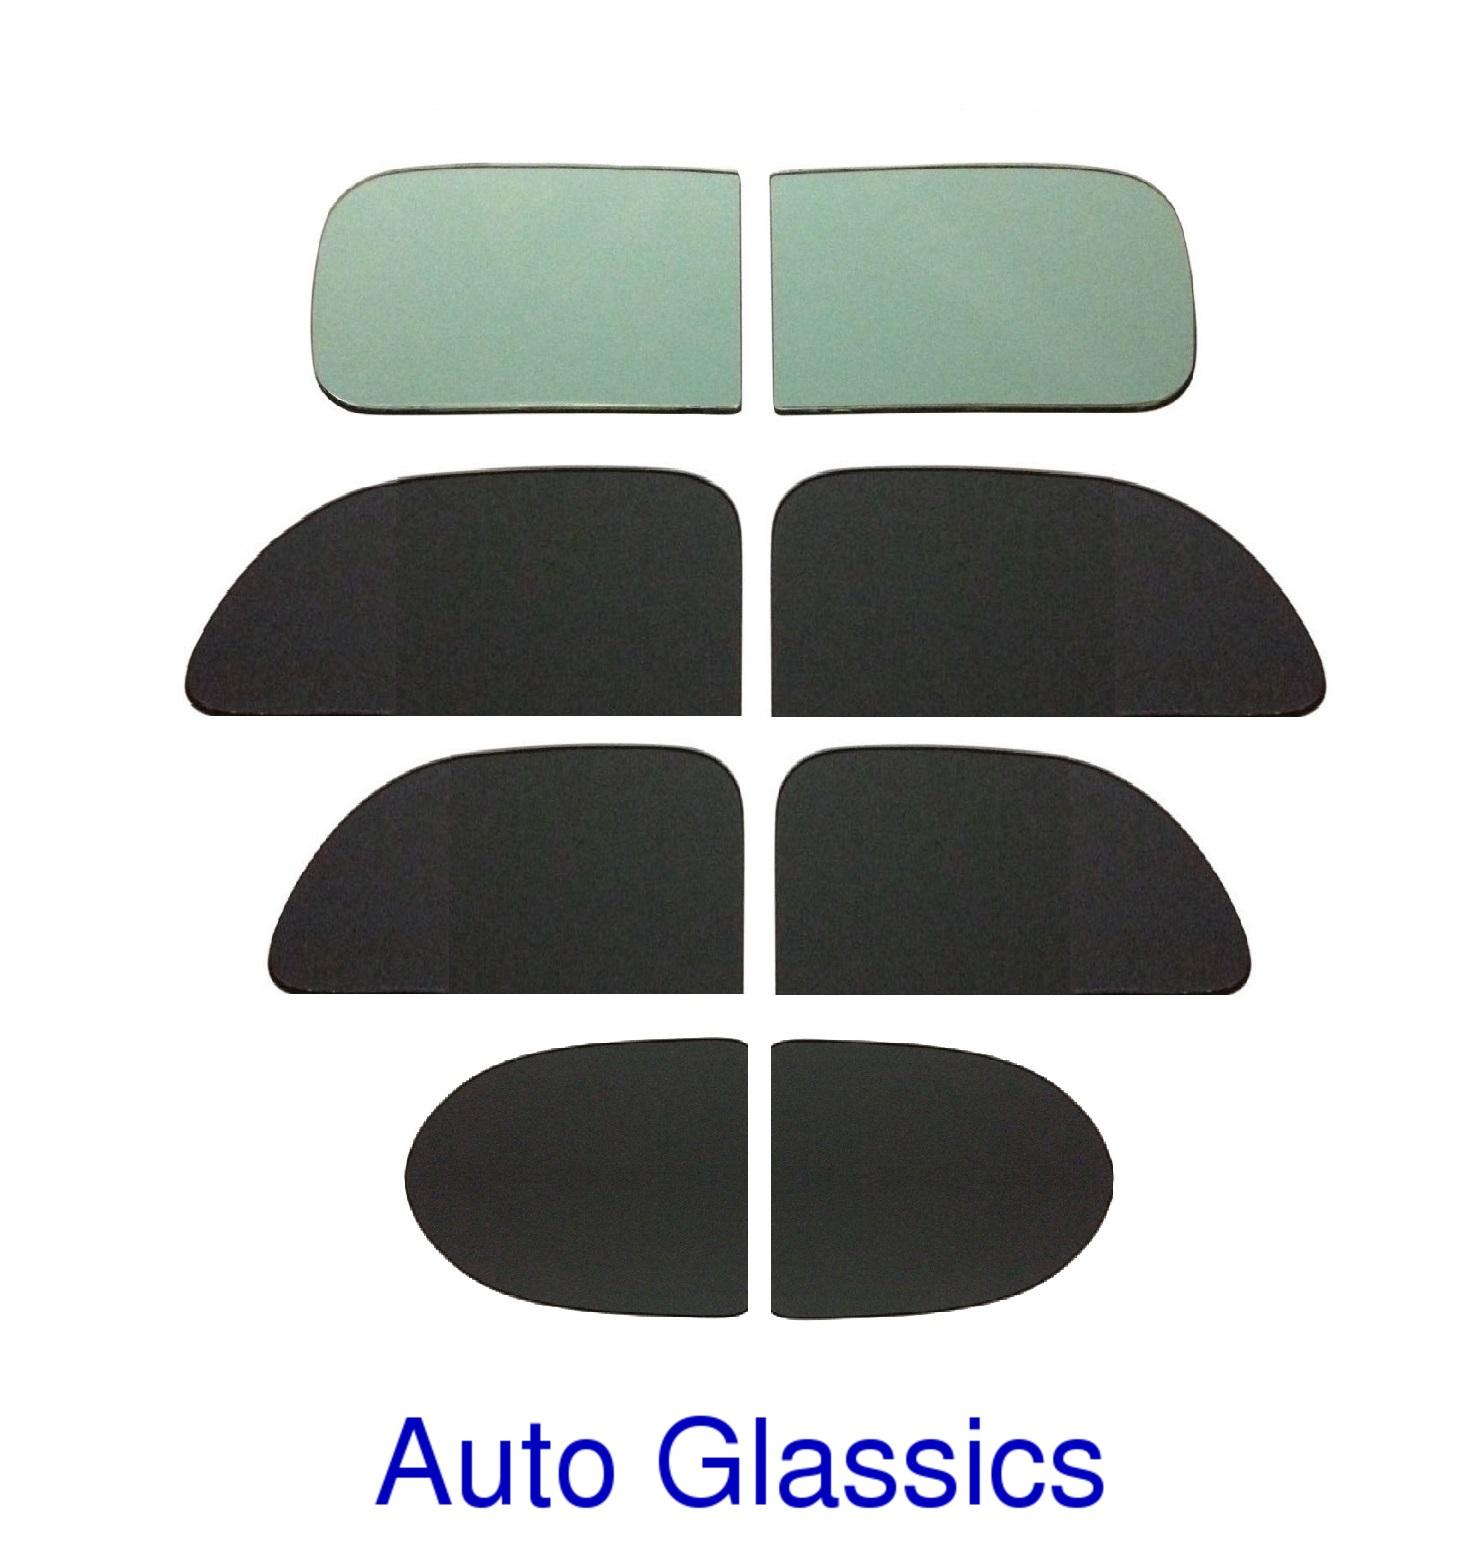 hight resolution of 1939 plymouth p7 2 door sedan classic auto glass kit new flat windows vintage